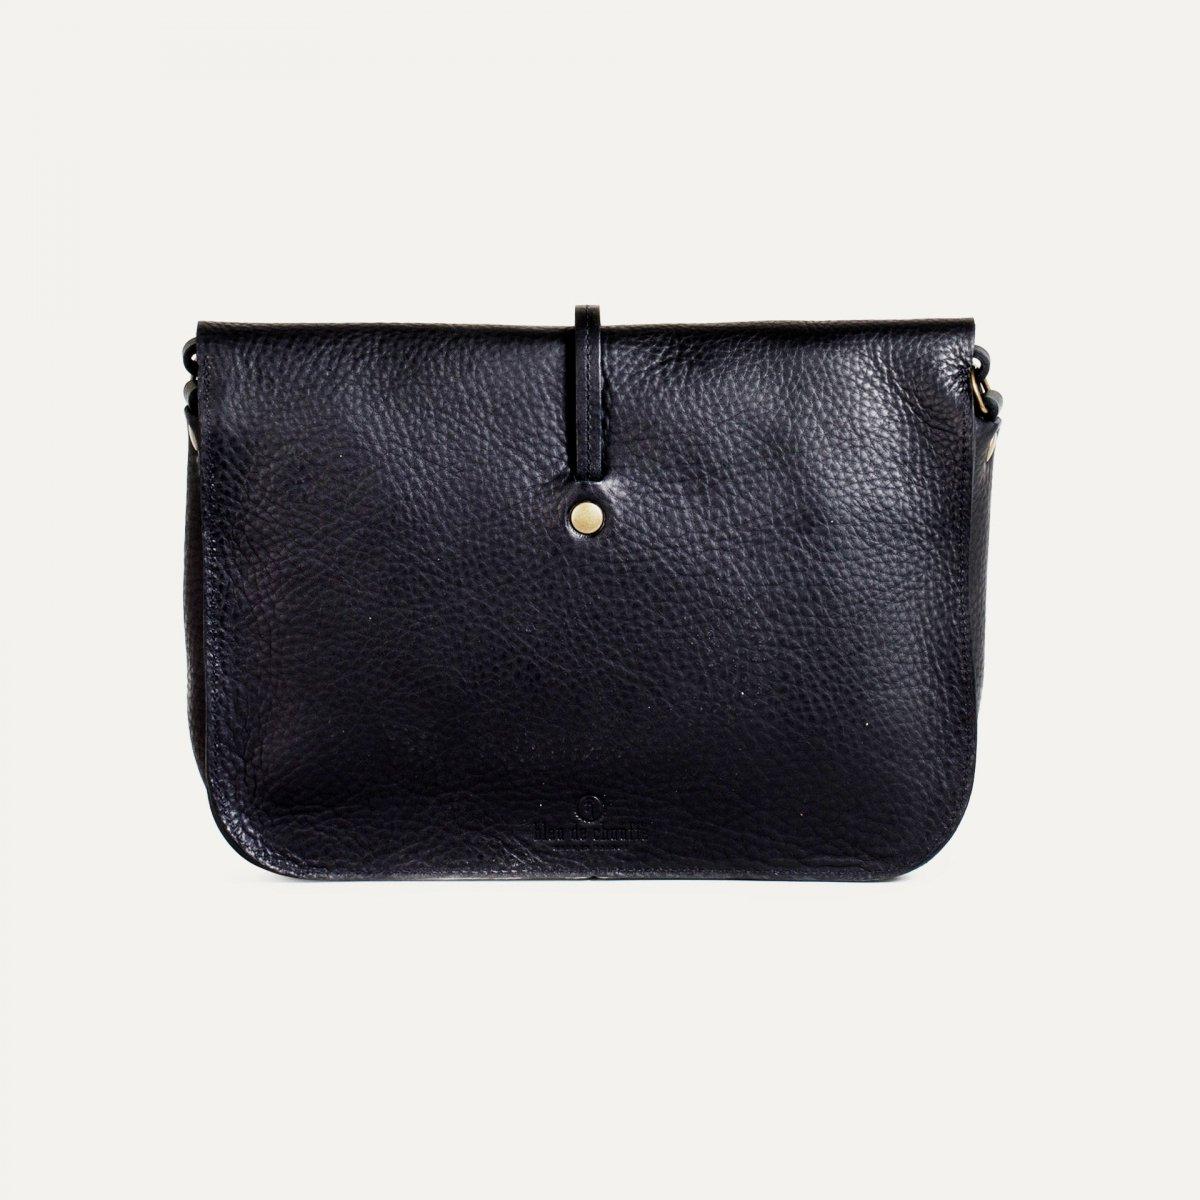 Pastel handbag - Black (image n°3)